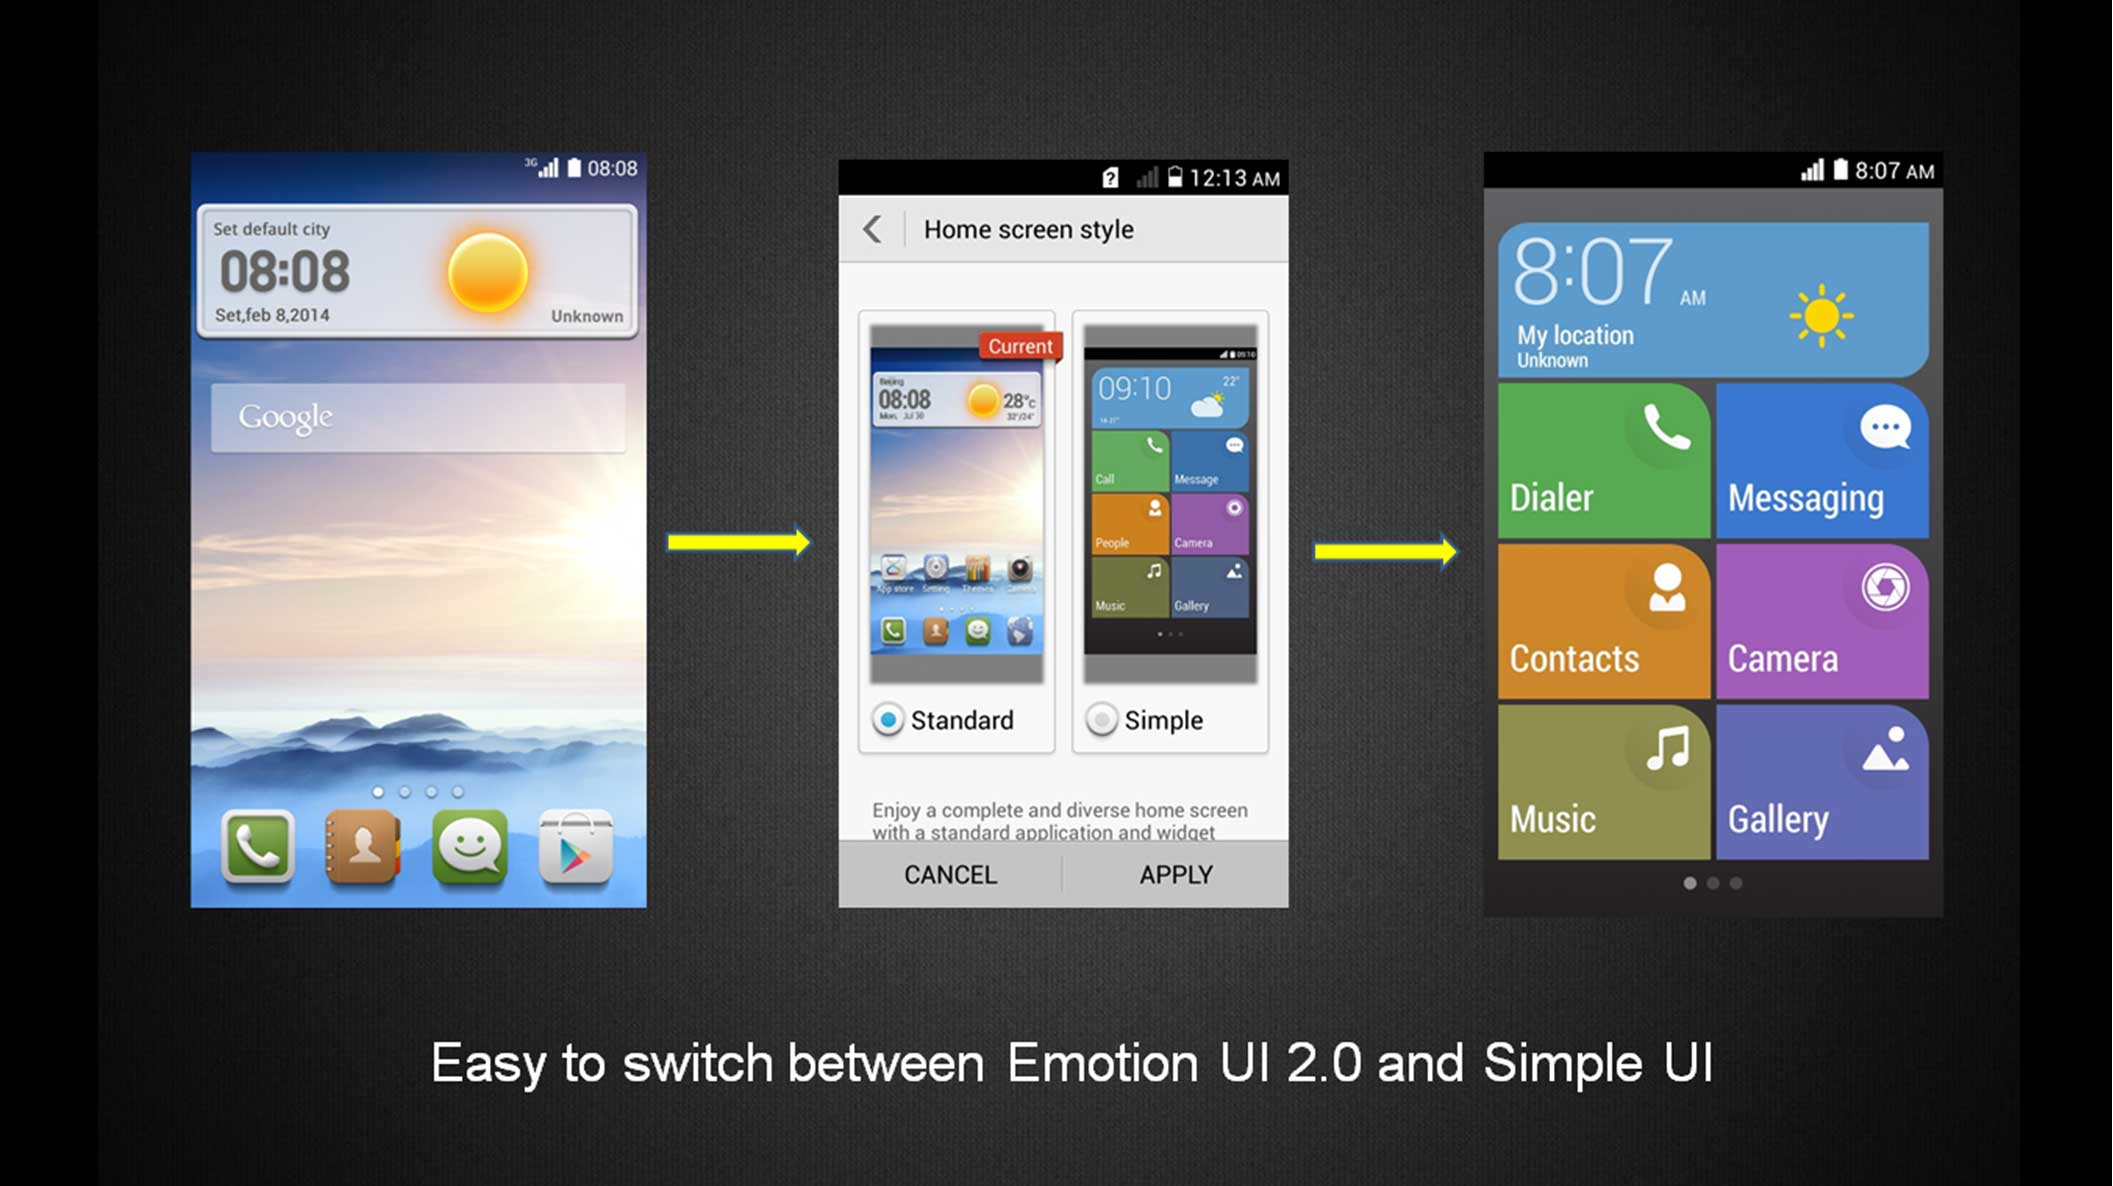 Huawei Ascend Y330 - Sim Free Smartphone Black (4 inch, 1 3GHz dual core) |  eBay